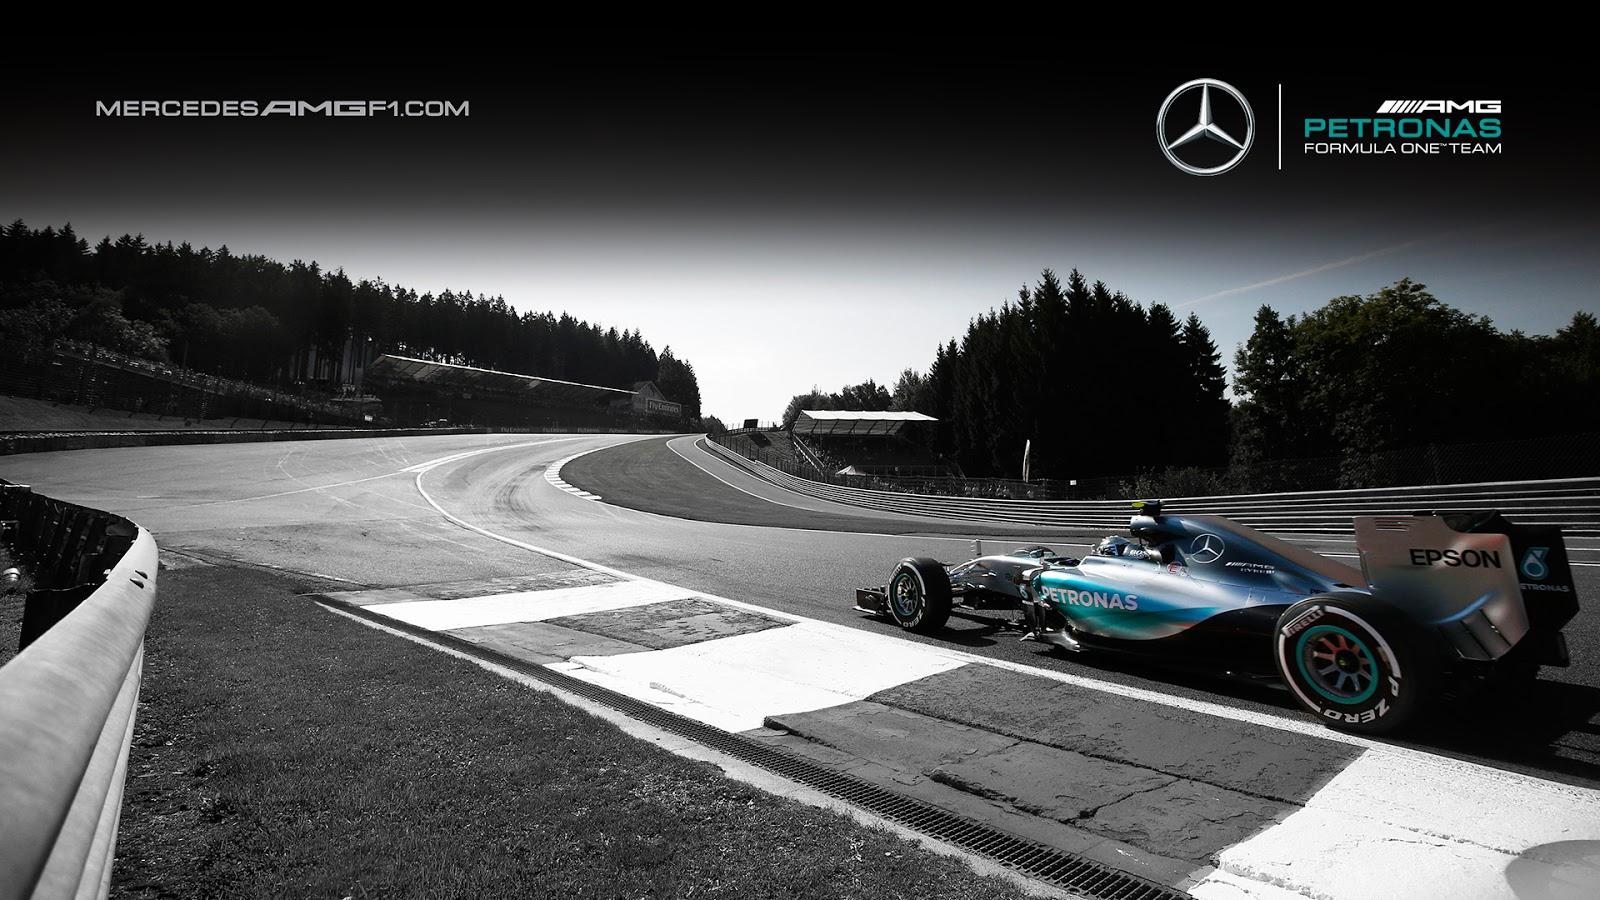 Mercedes AMG Petronas Wallpaper - WallpaperSafari